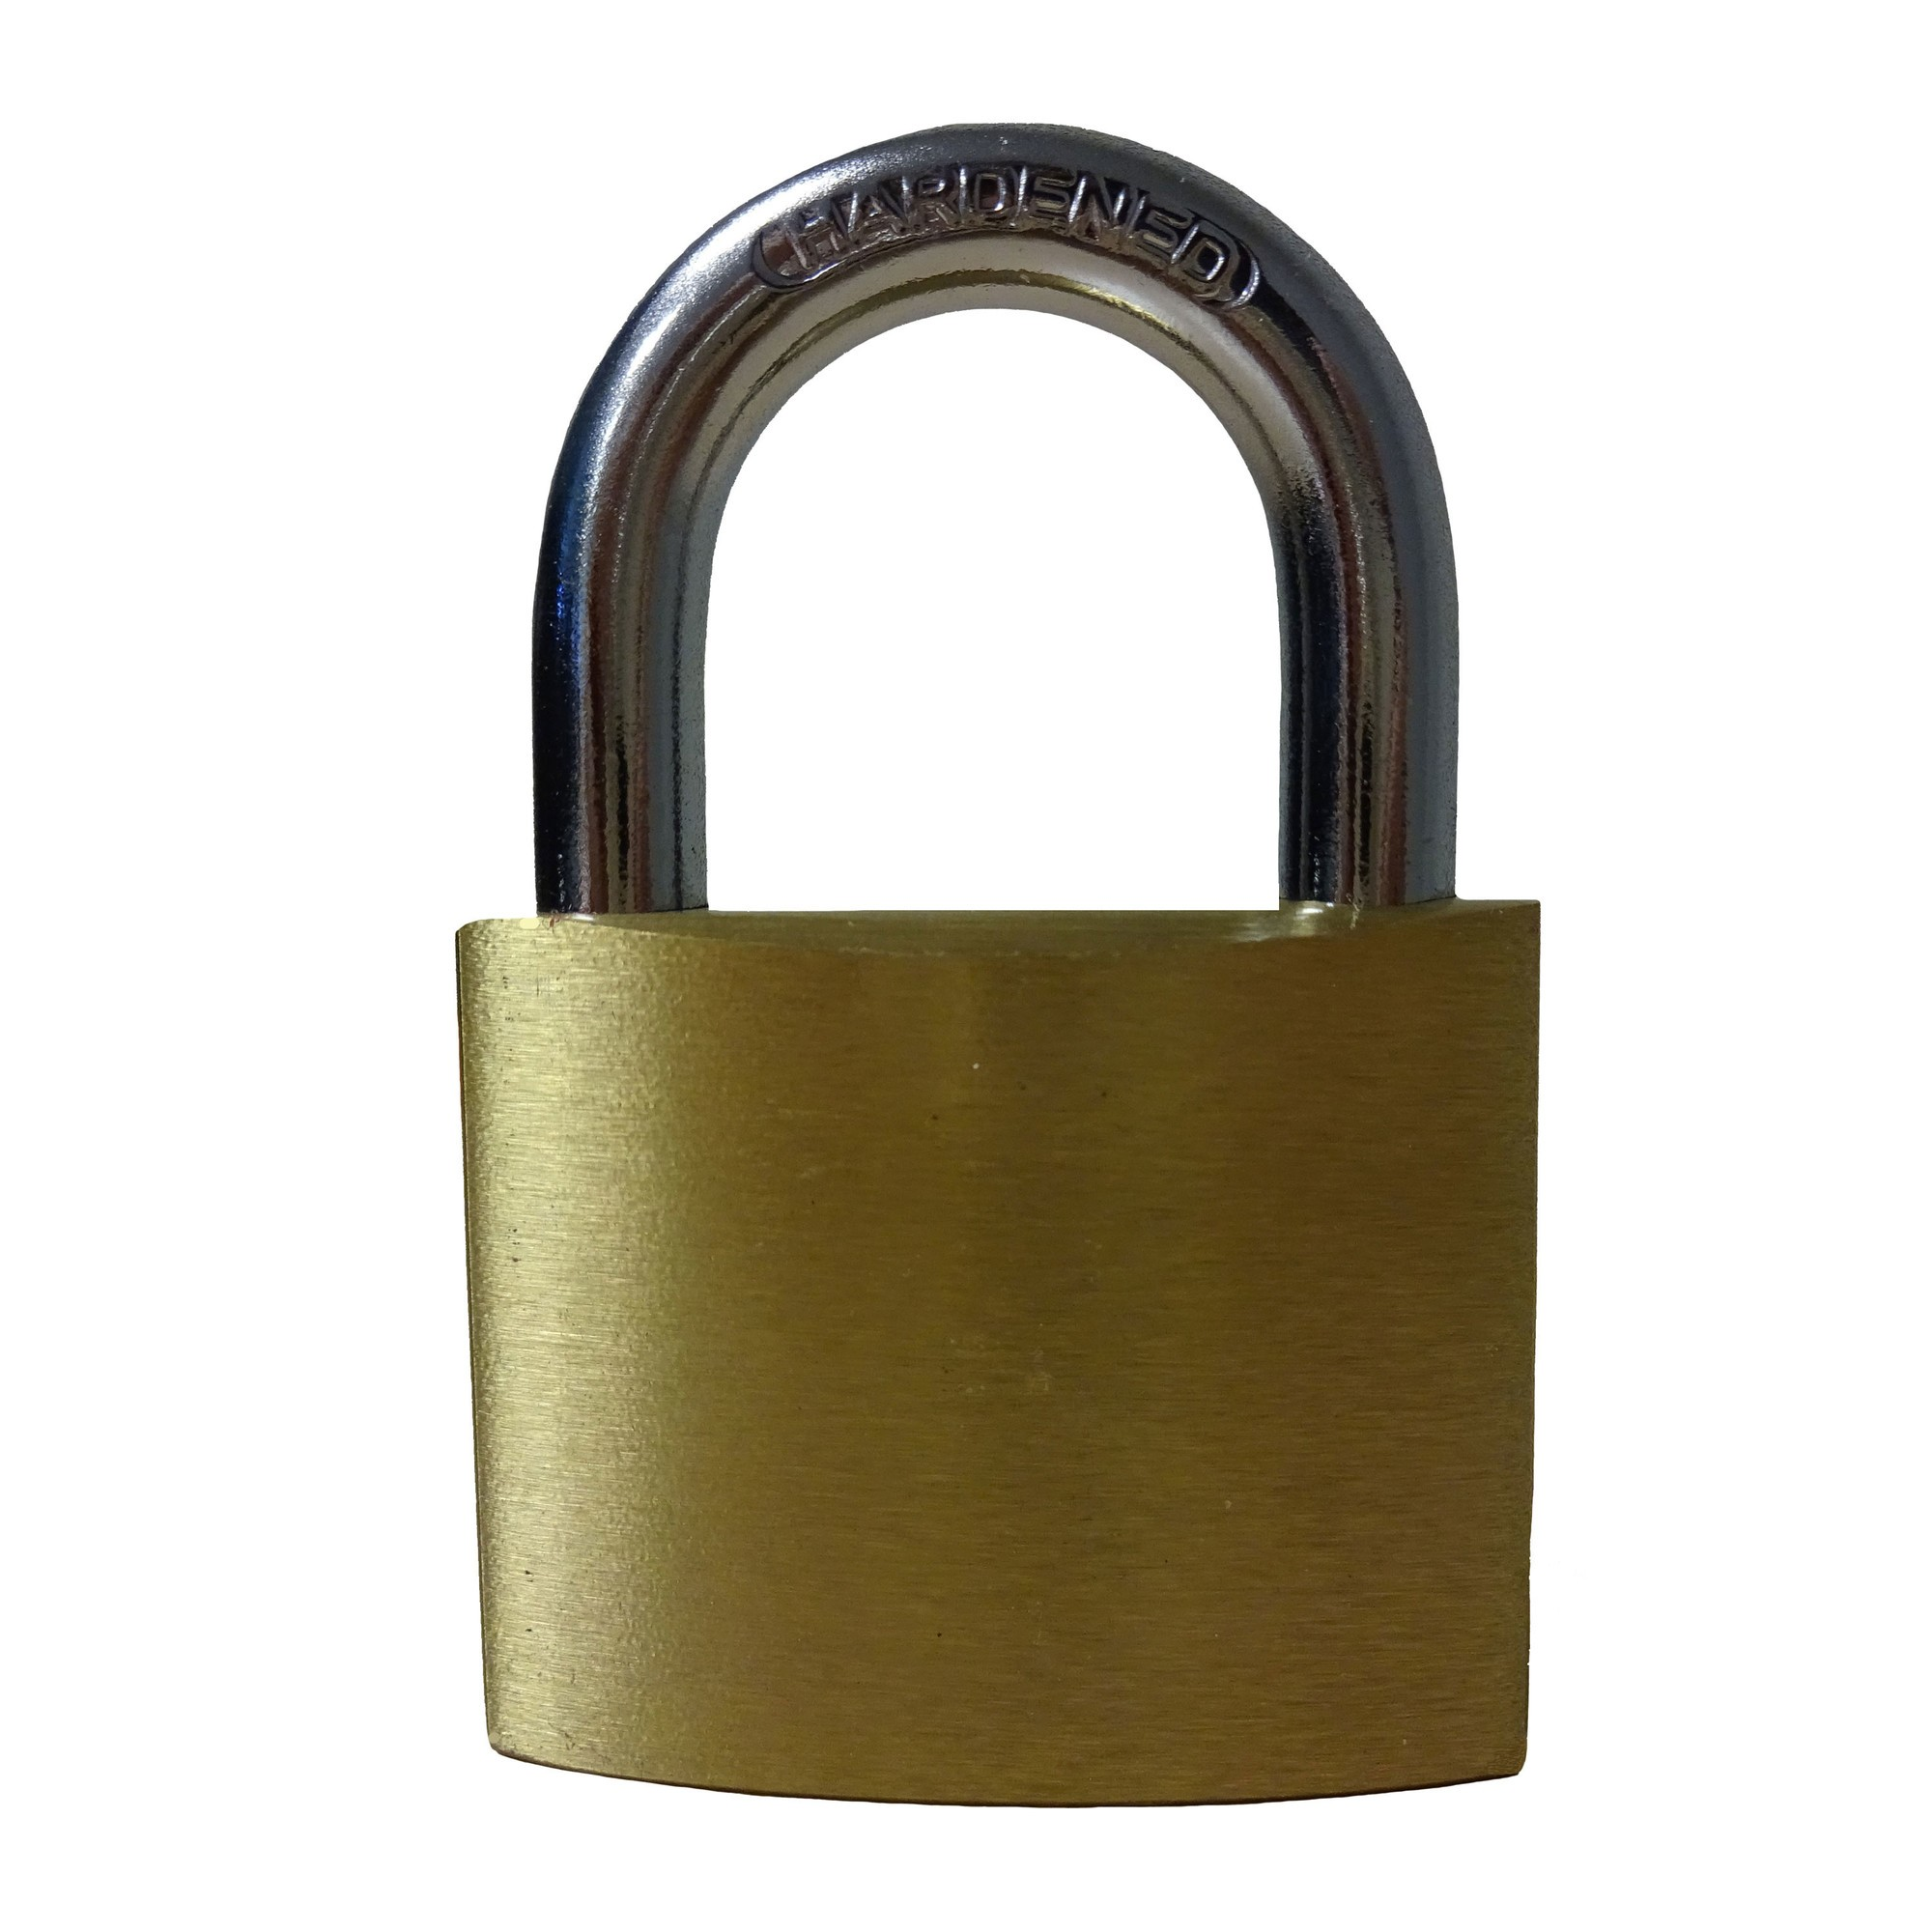 Afbeelding van Carpoint hangslot inclusief 2 sleutels 50mm